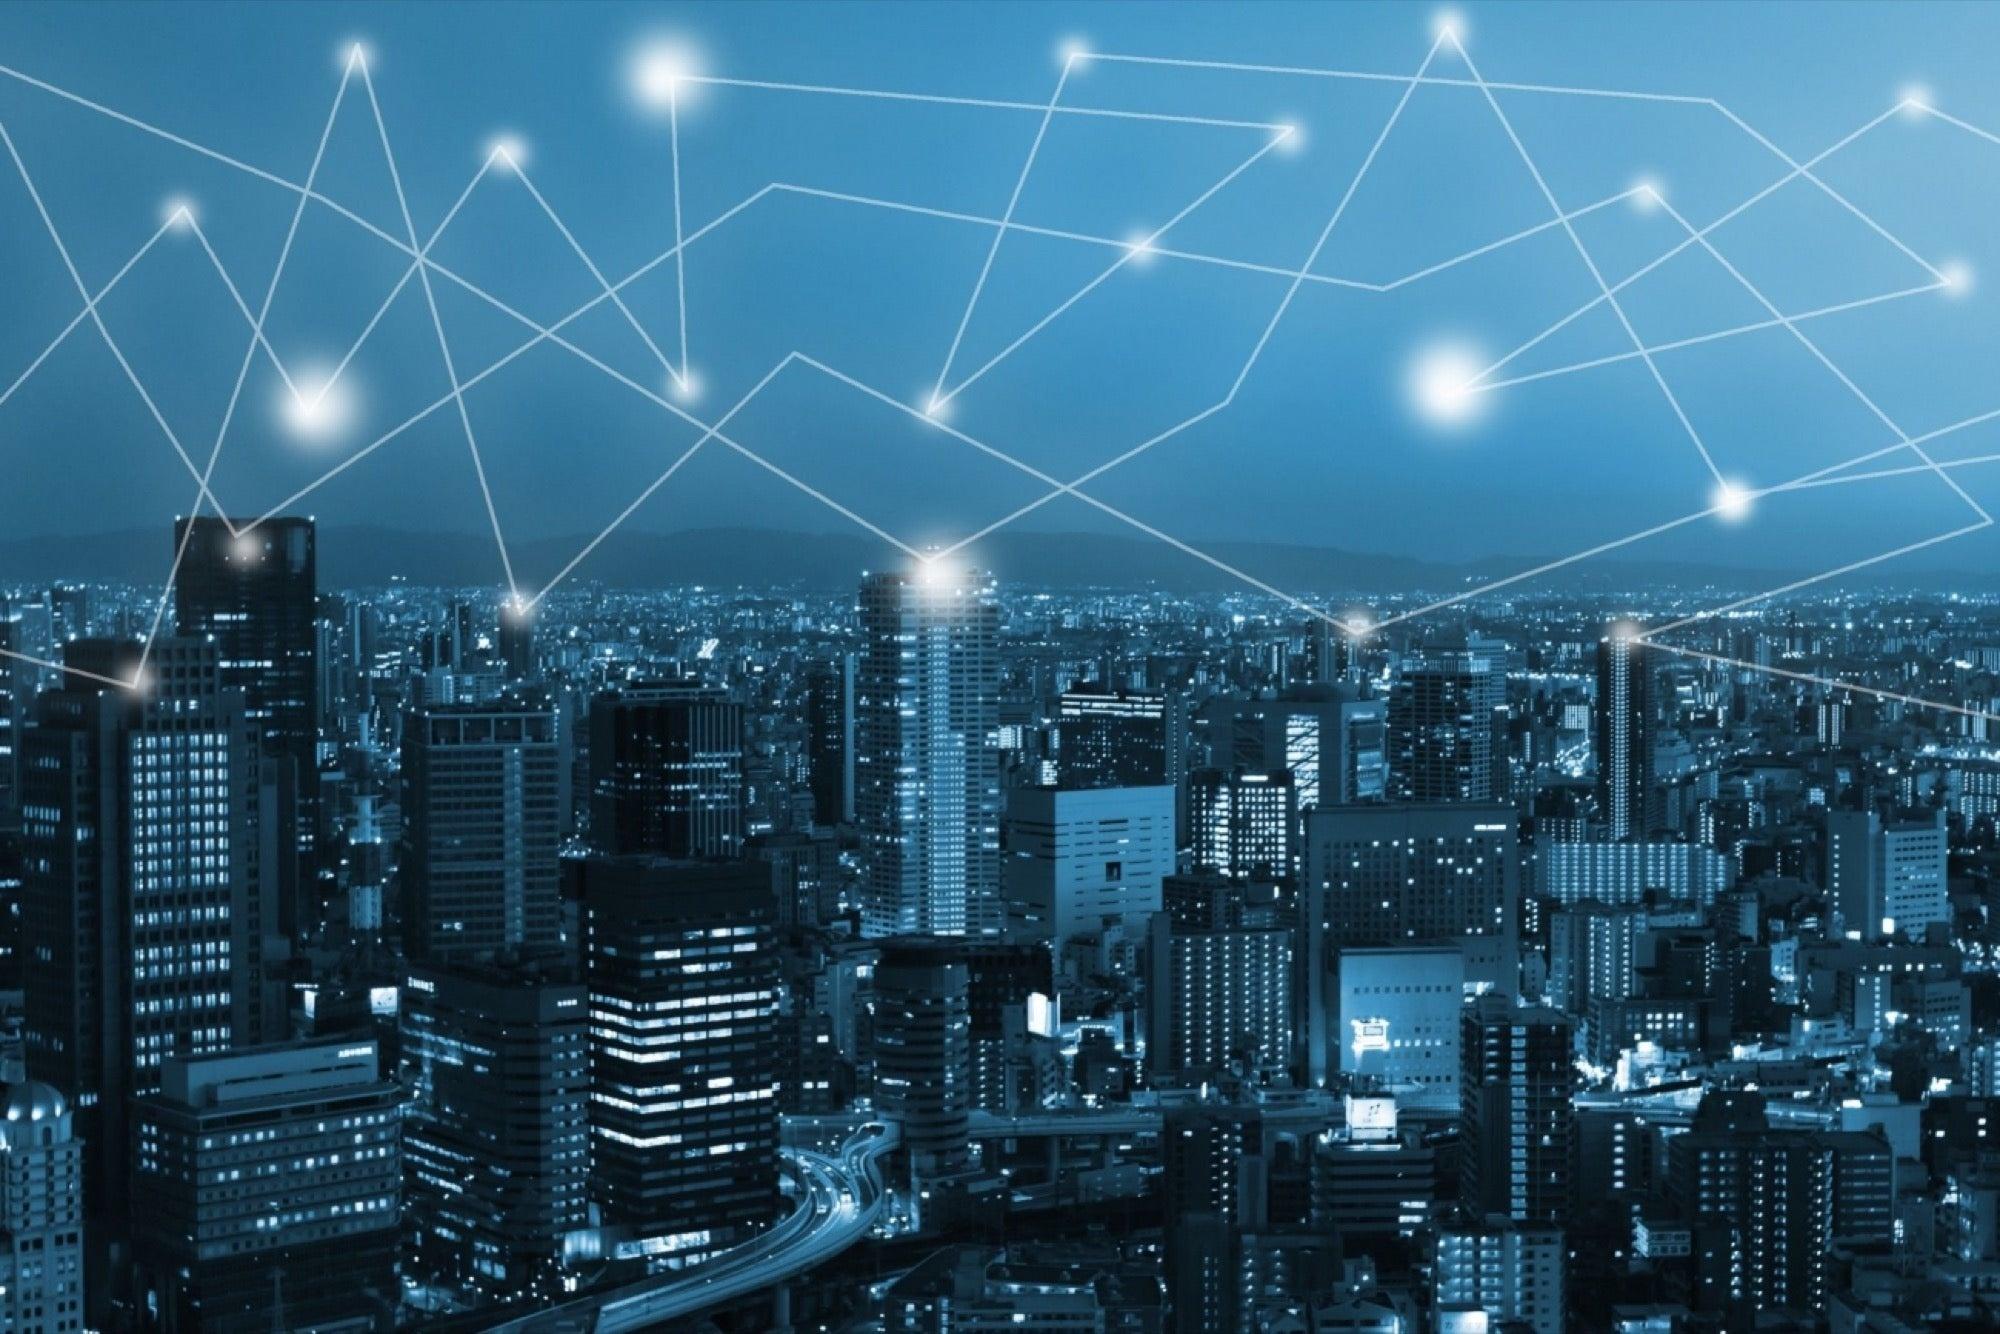 Edtech Startup Udacity Launches A Blockchain Nanodegree Program For MENA